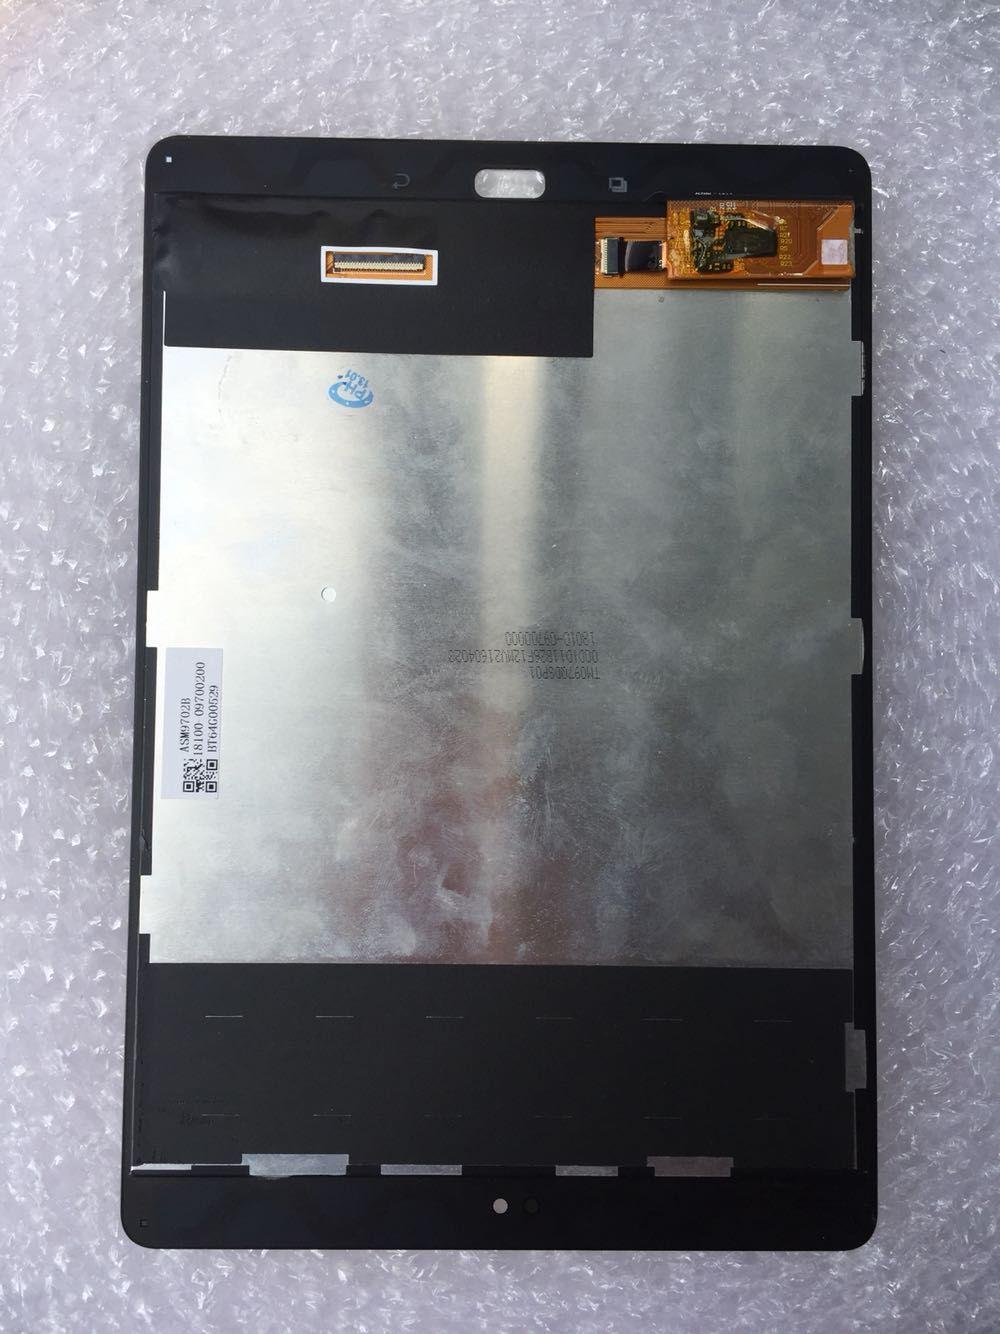 For ASUS ZenPad 3S 10 Z500M P027 Z500KL P001 LCD Display Matrix Touch Screen Digitizer Sensor Tablet PC Parts Assembly